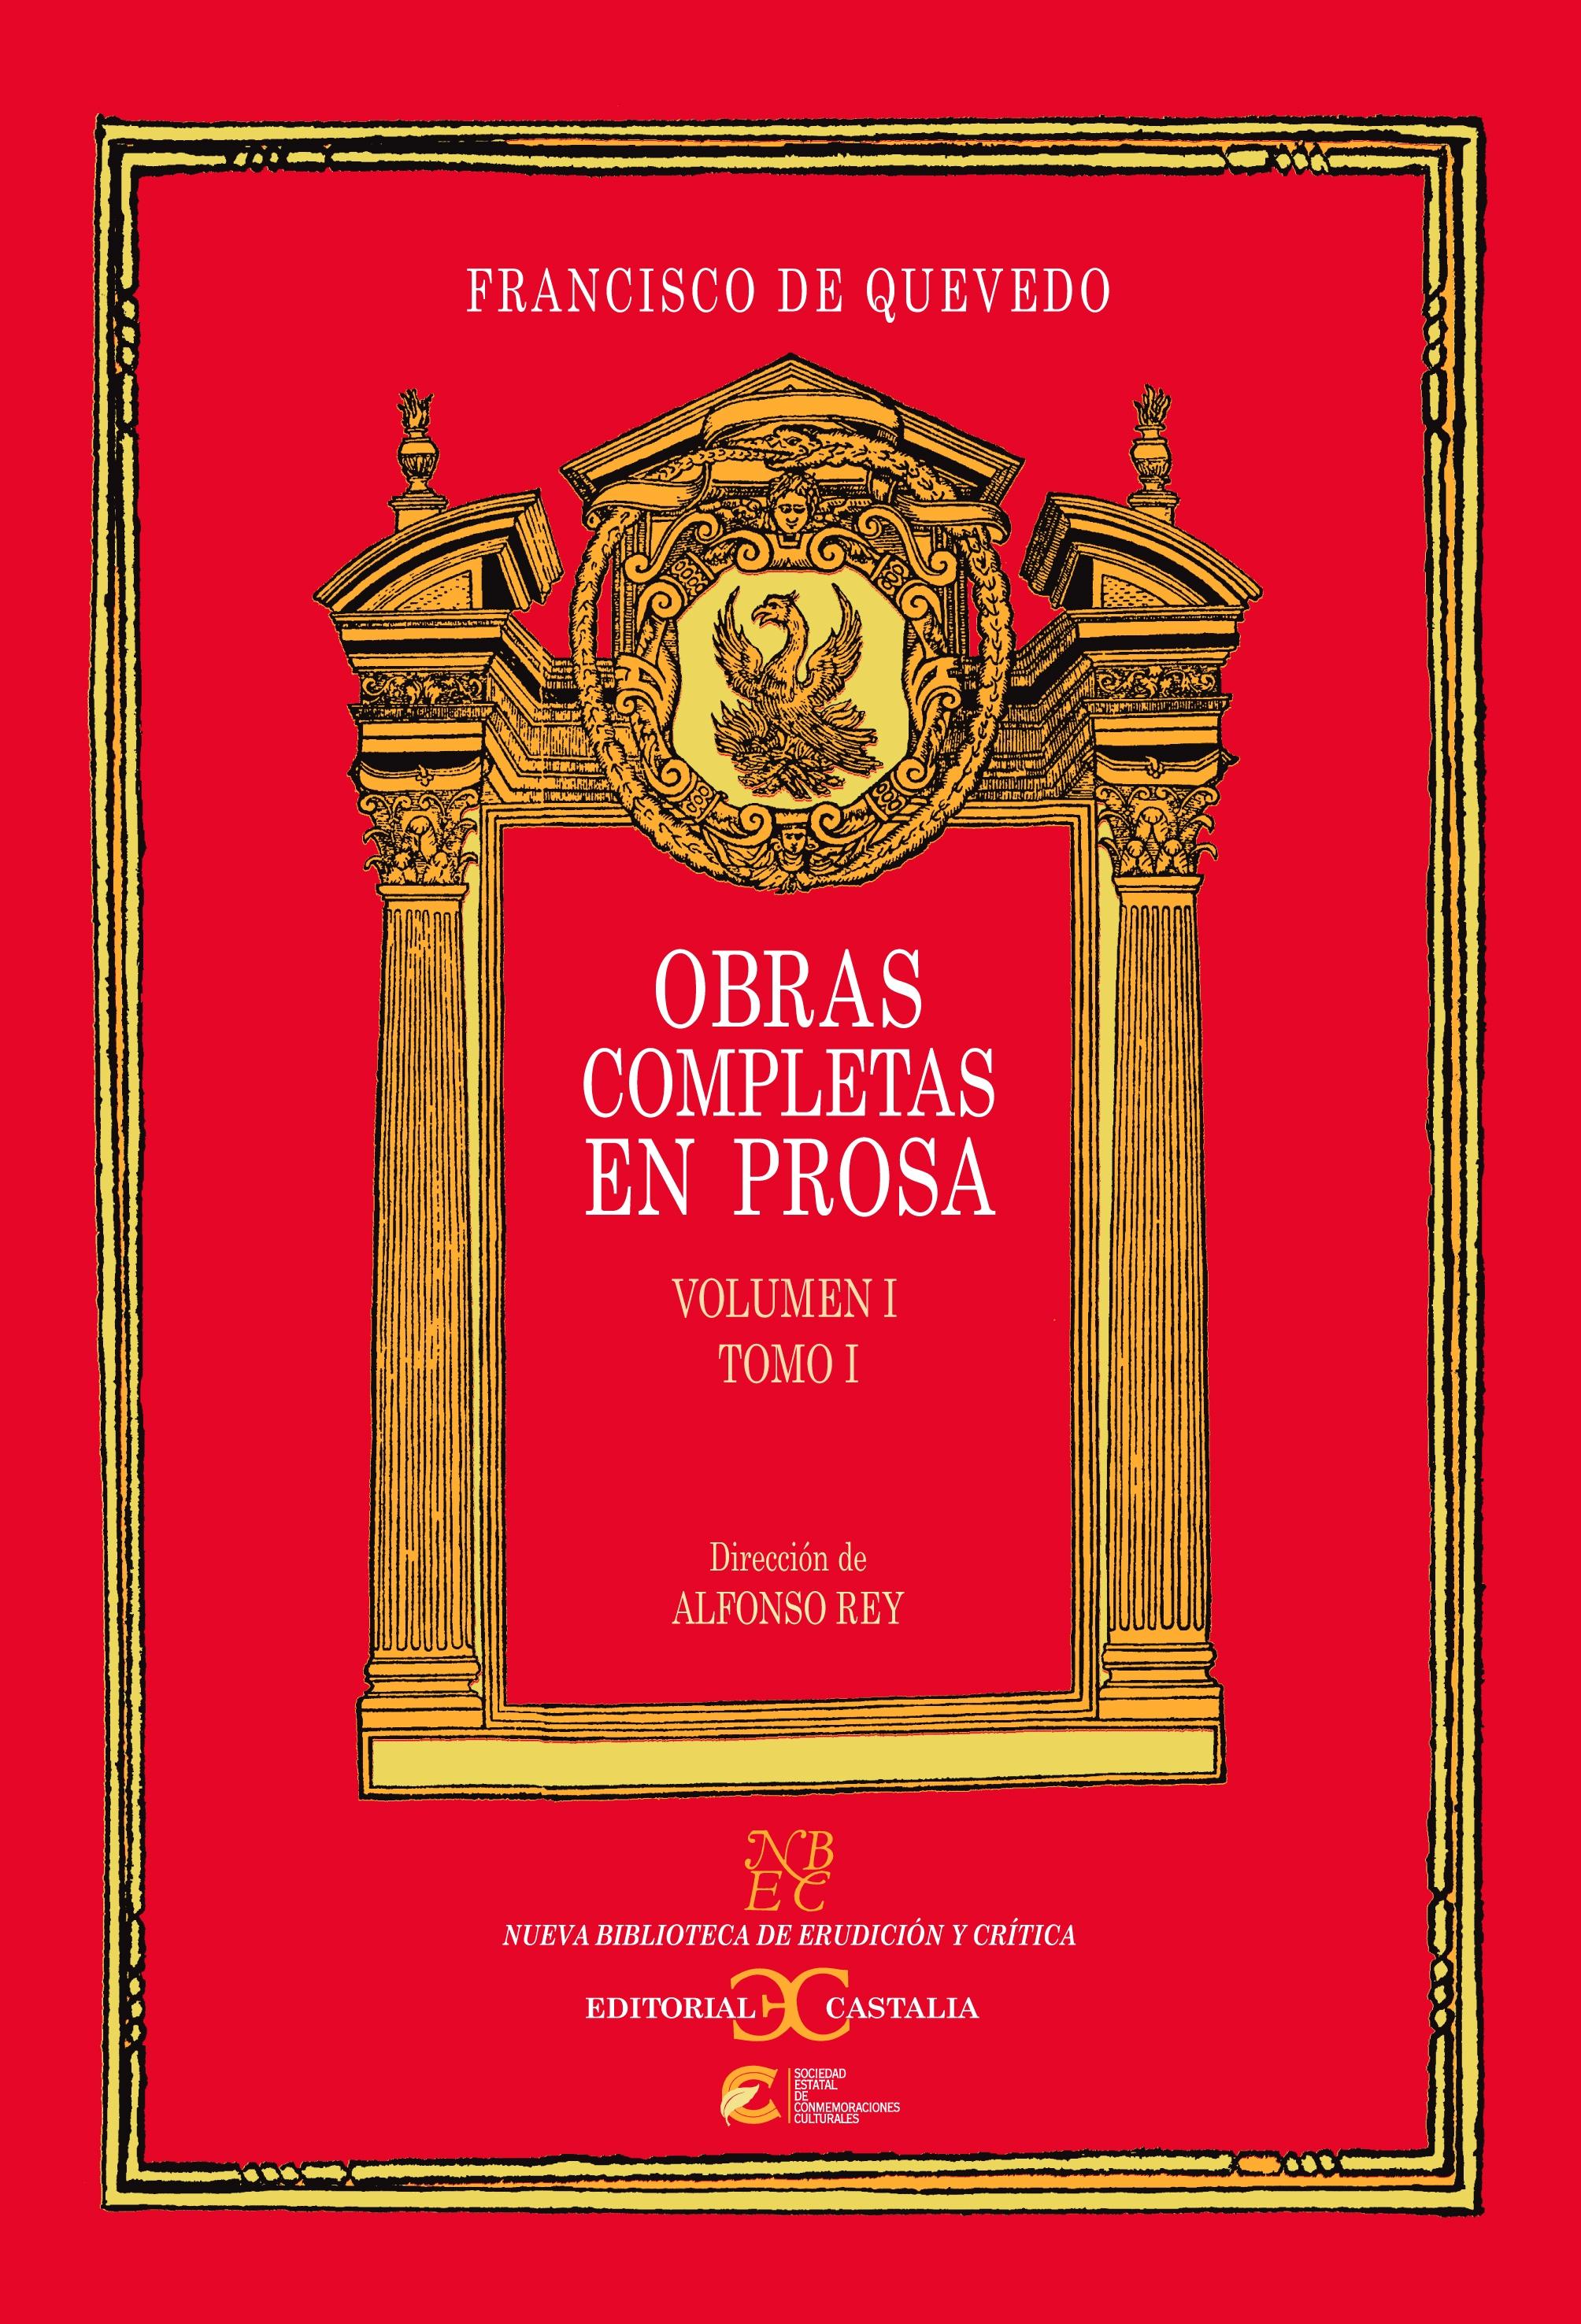 Obras completas en prosa. Volumen I, Tomo I